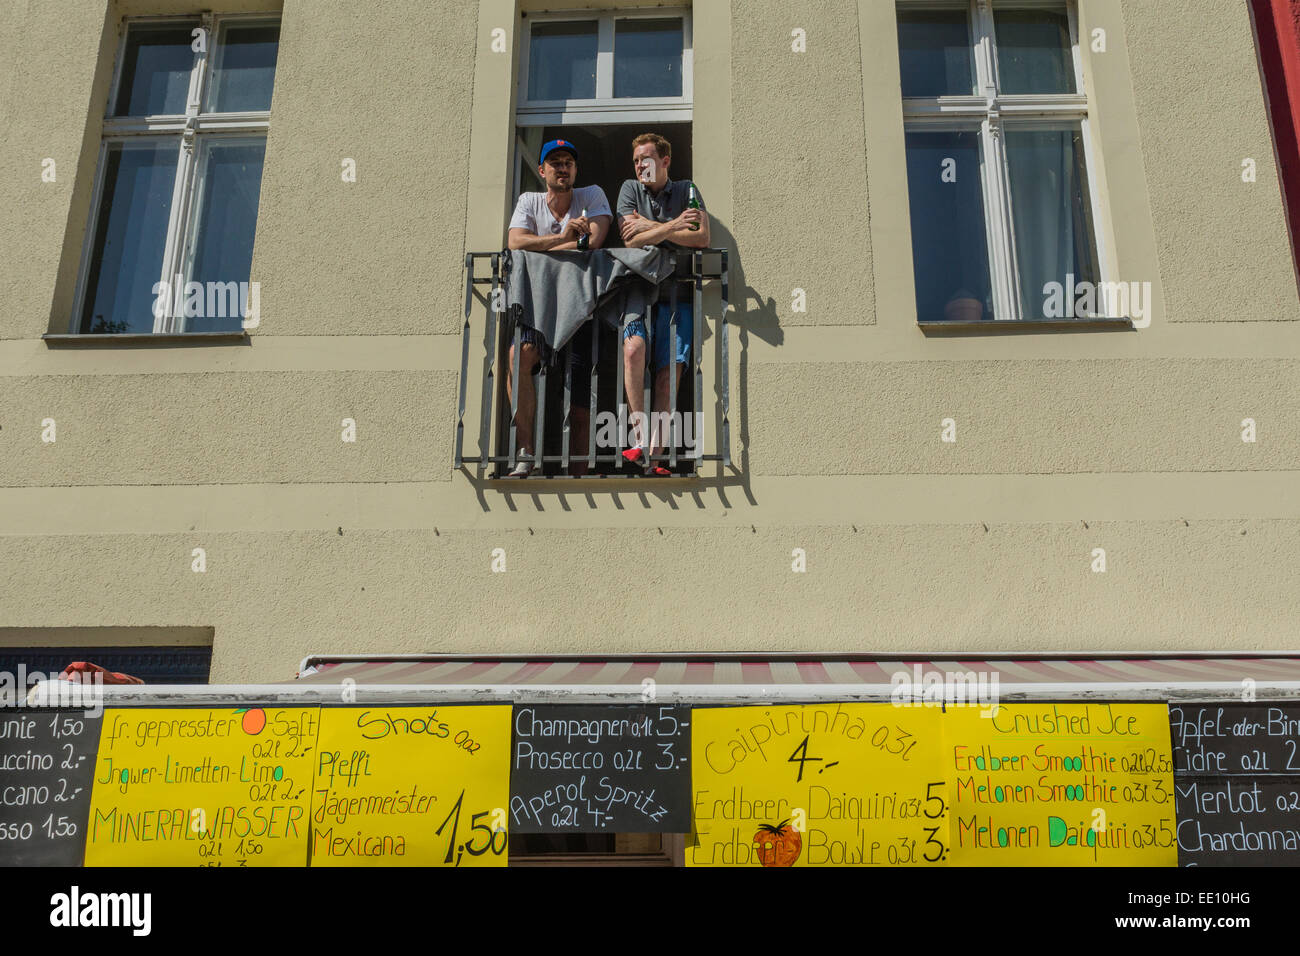 Annual street parade 'Carnival of Cultures' through Kreuzberg, Berlin, Germany - Stock Image